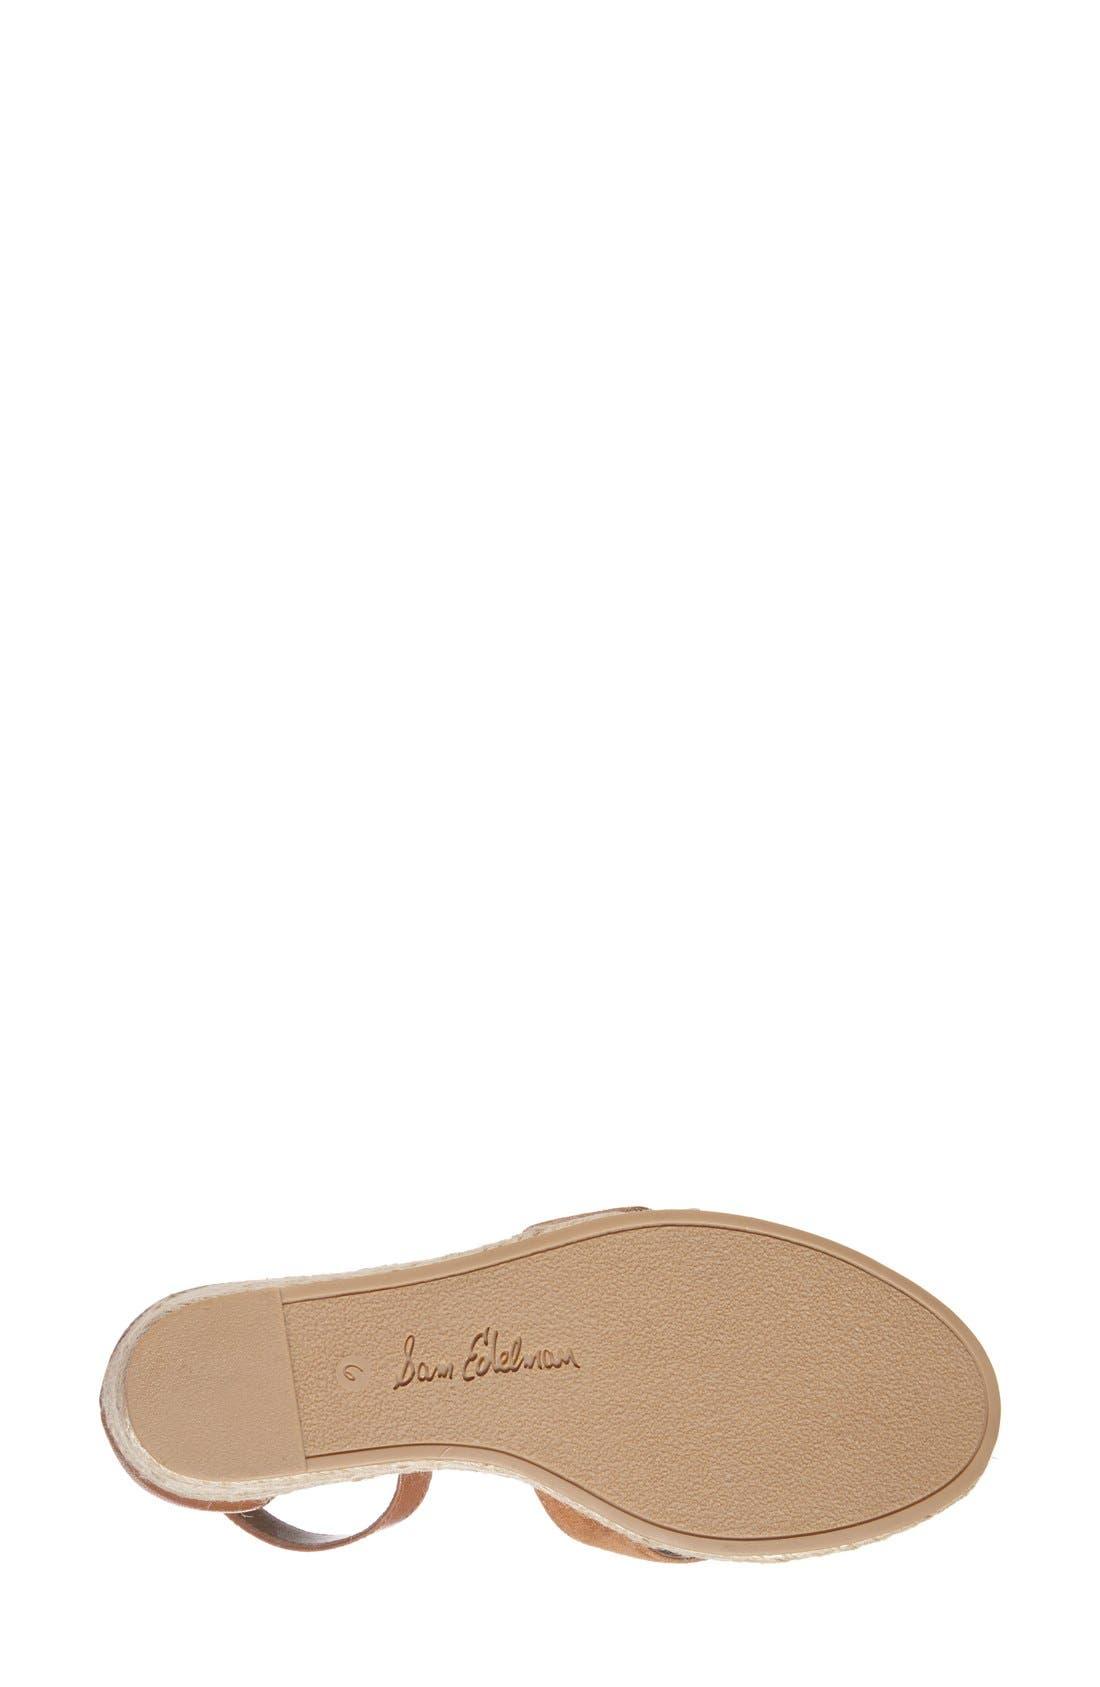 'Brenda' Espadrille Wedge Sandal,                             Alternate thumbnail 4, color,                             Saddle